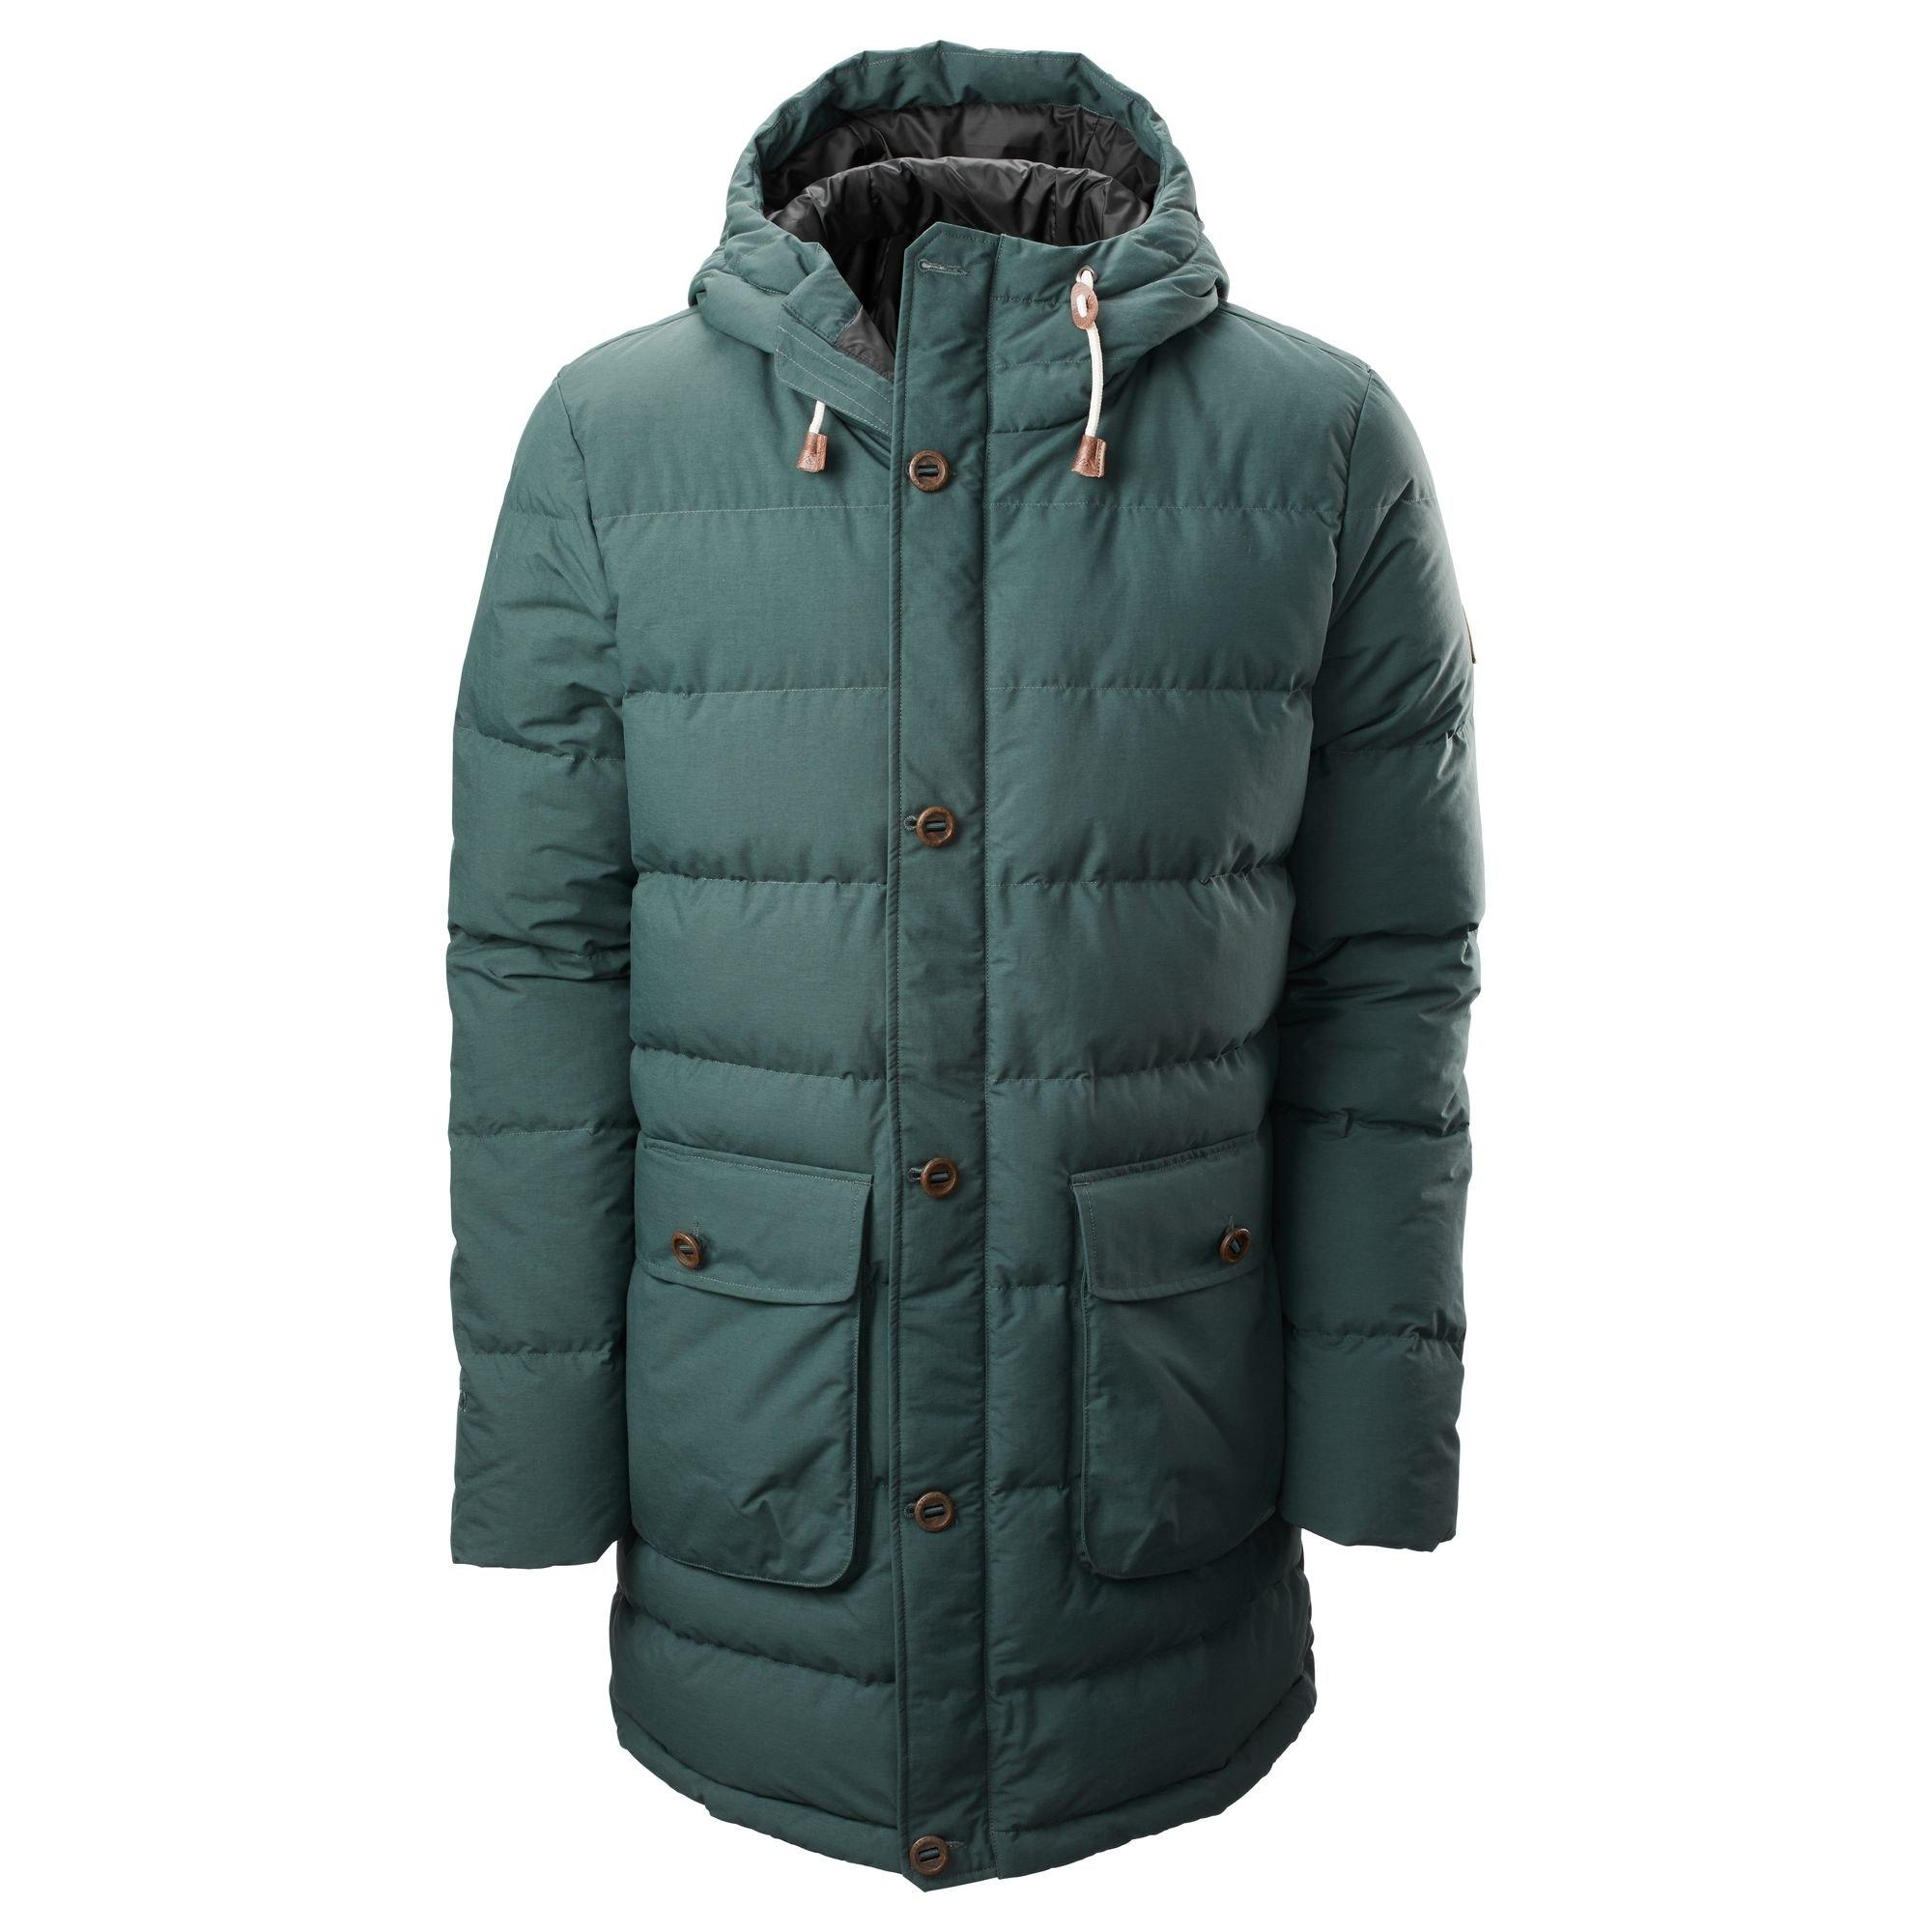 mens jackets for sale online winter coats for men in australia rh kathmandu com au